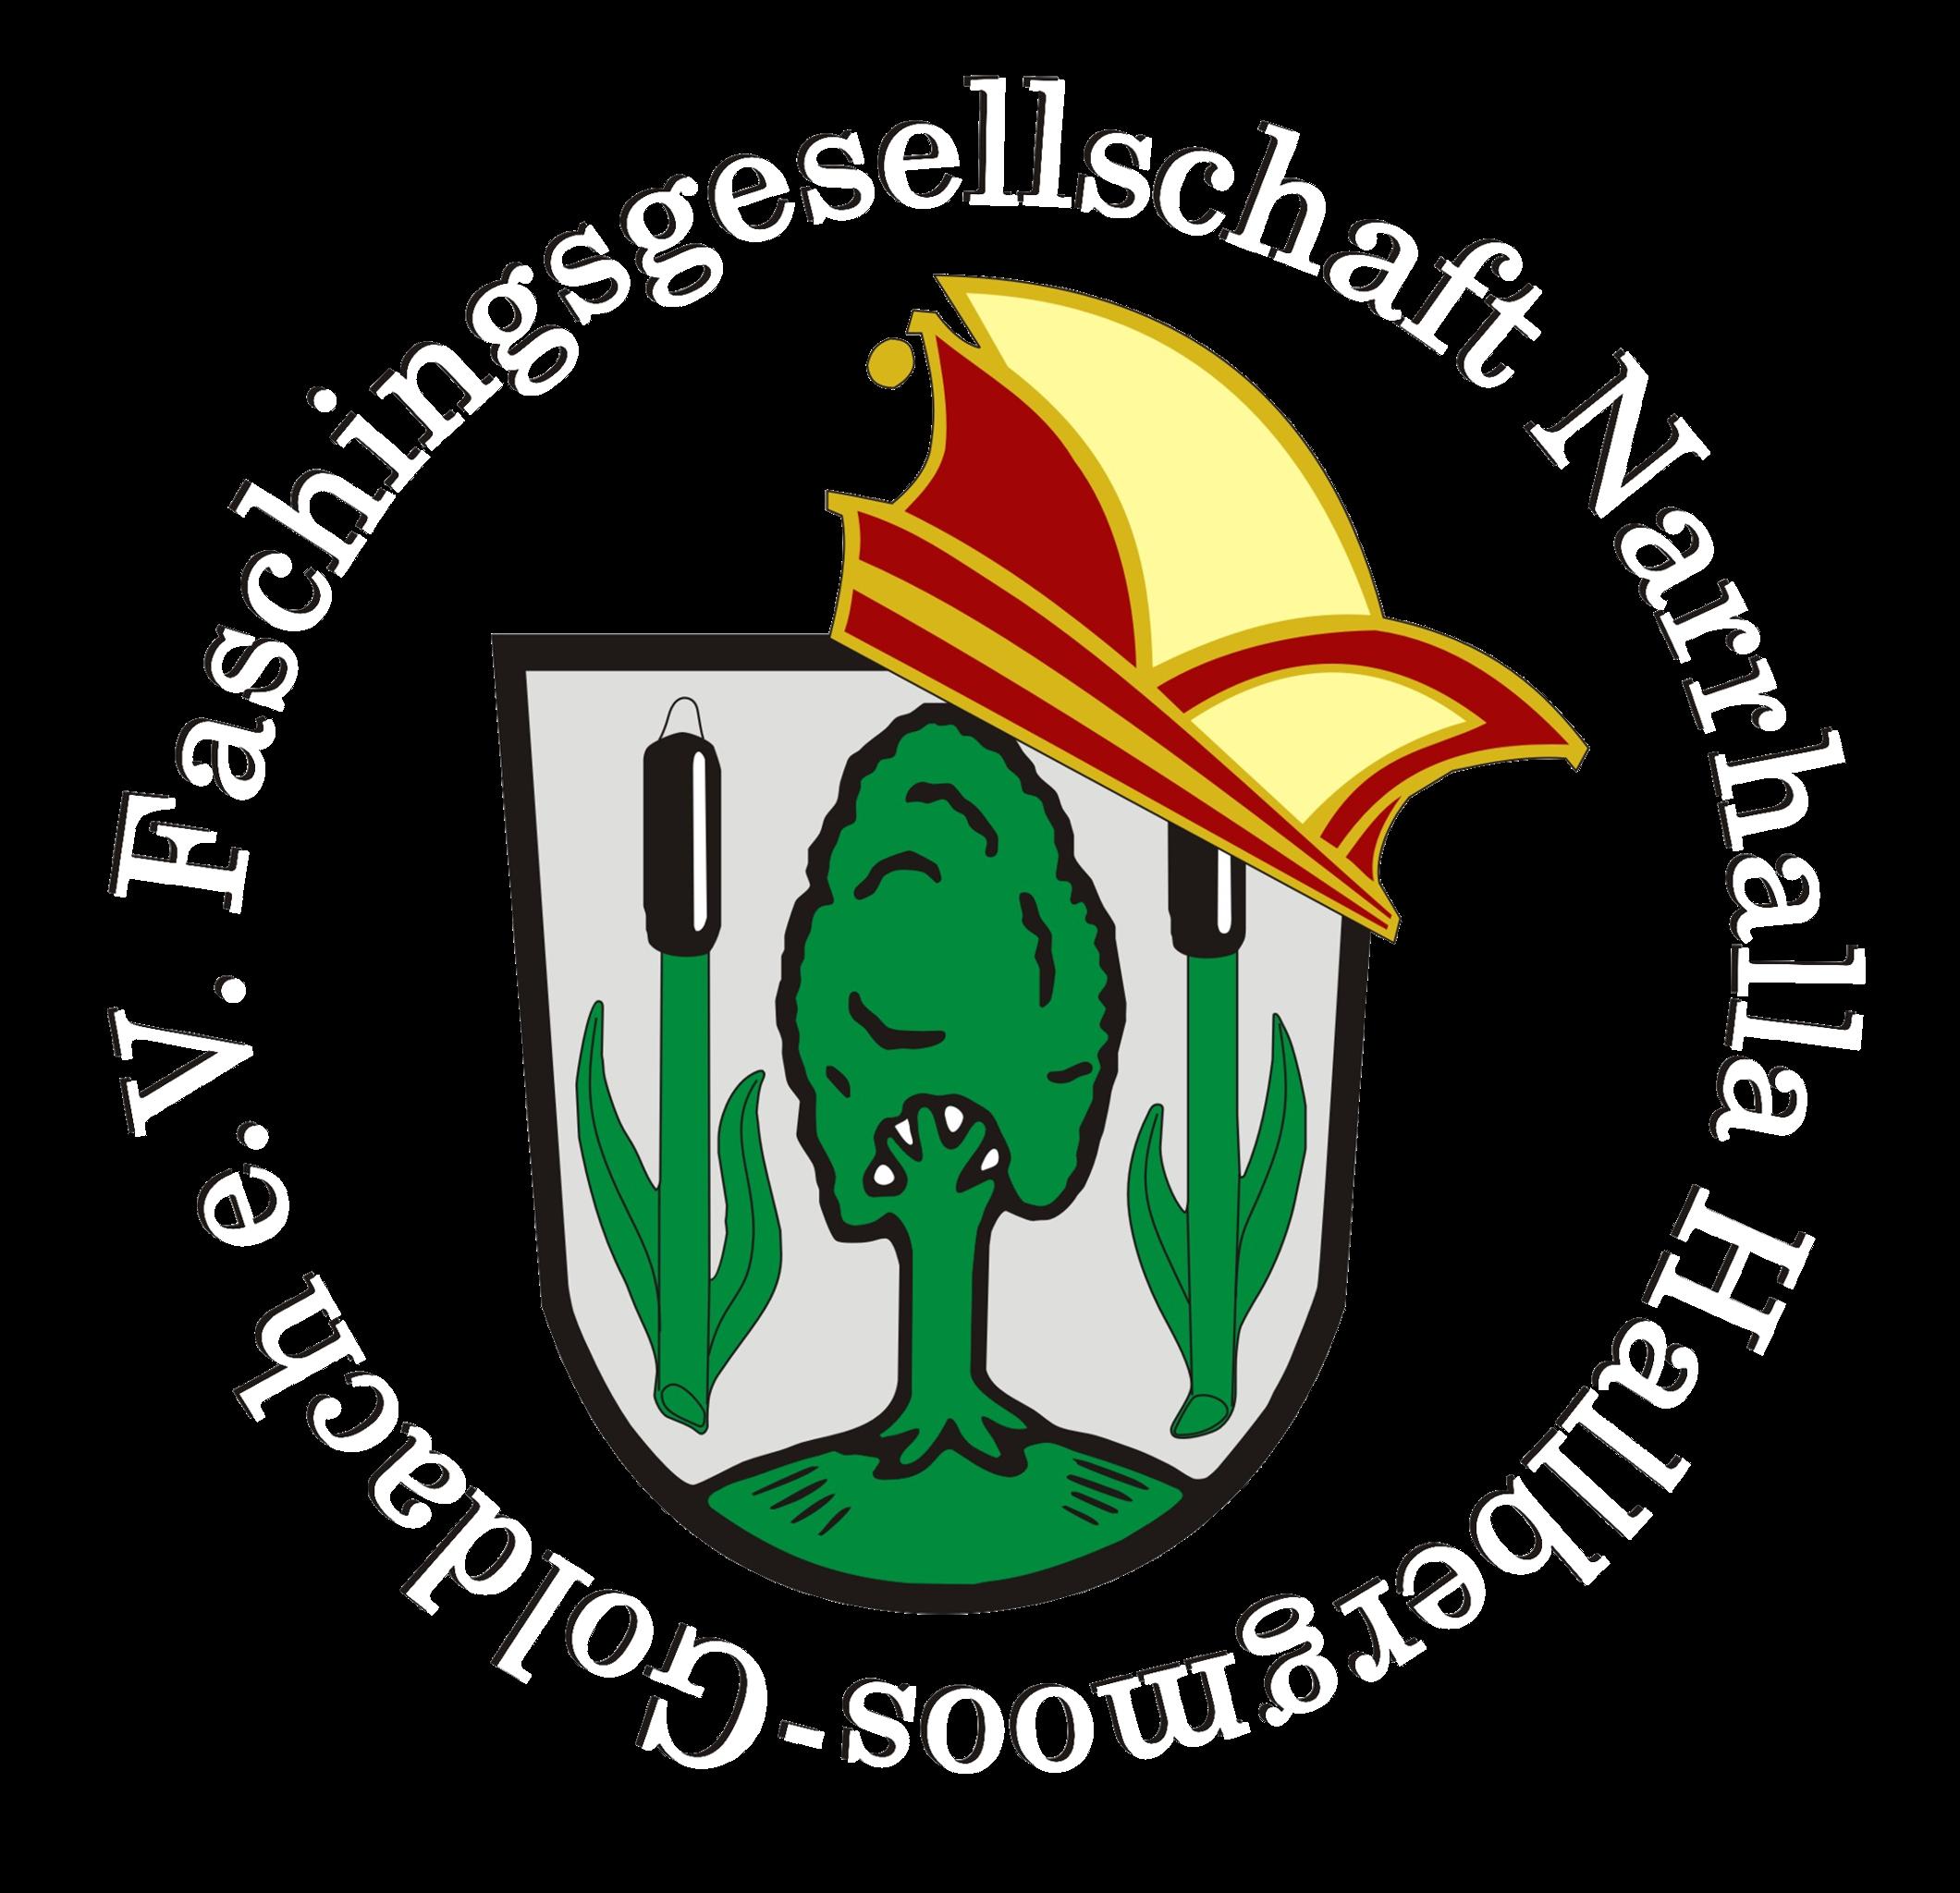 Faschingsgesellschaft Narrhalla Hallbergmoos-Goldach e.V.